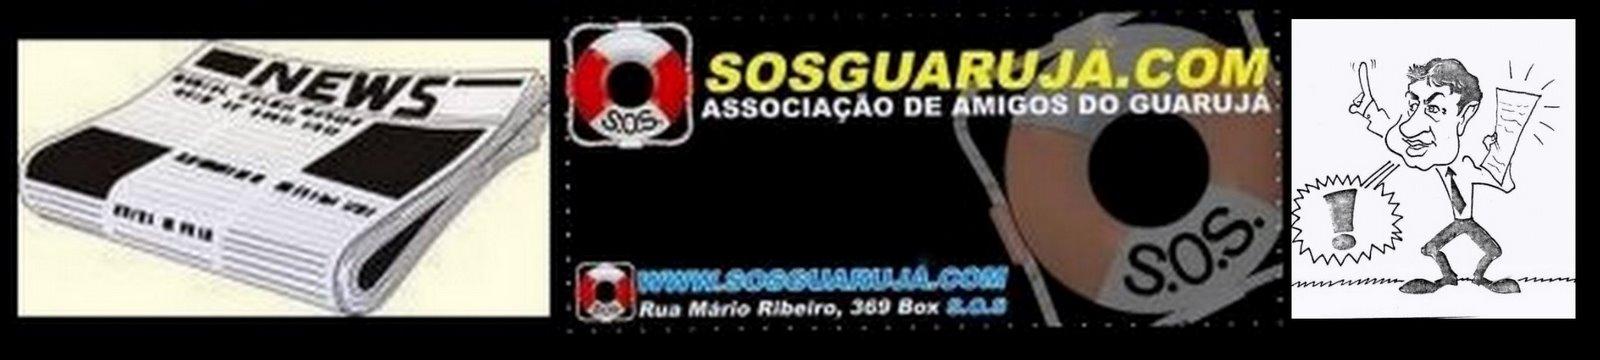 www.sosguaruja.com  Guarujá